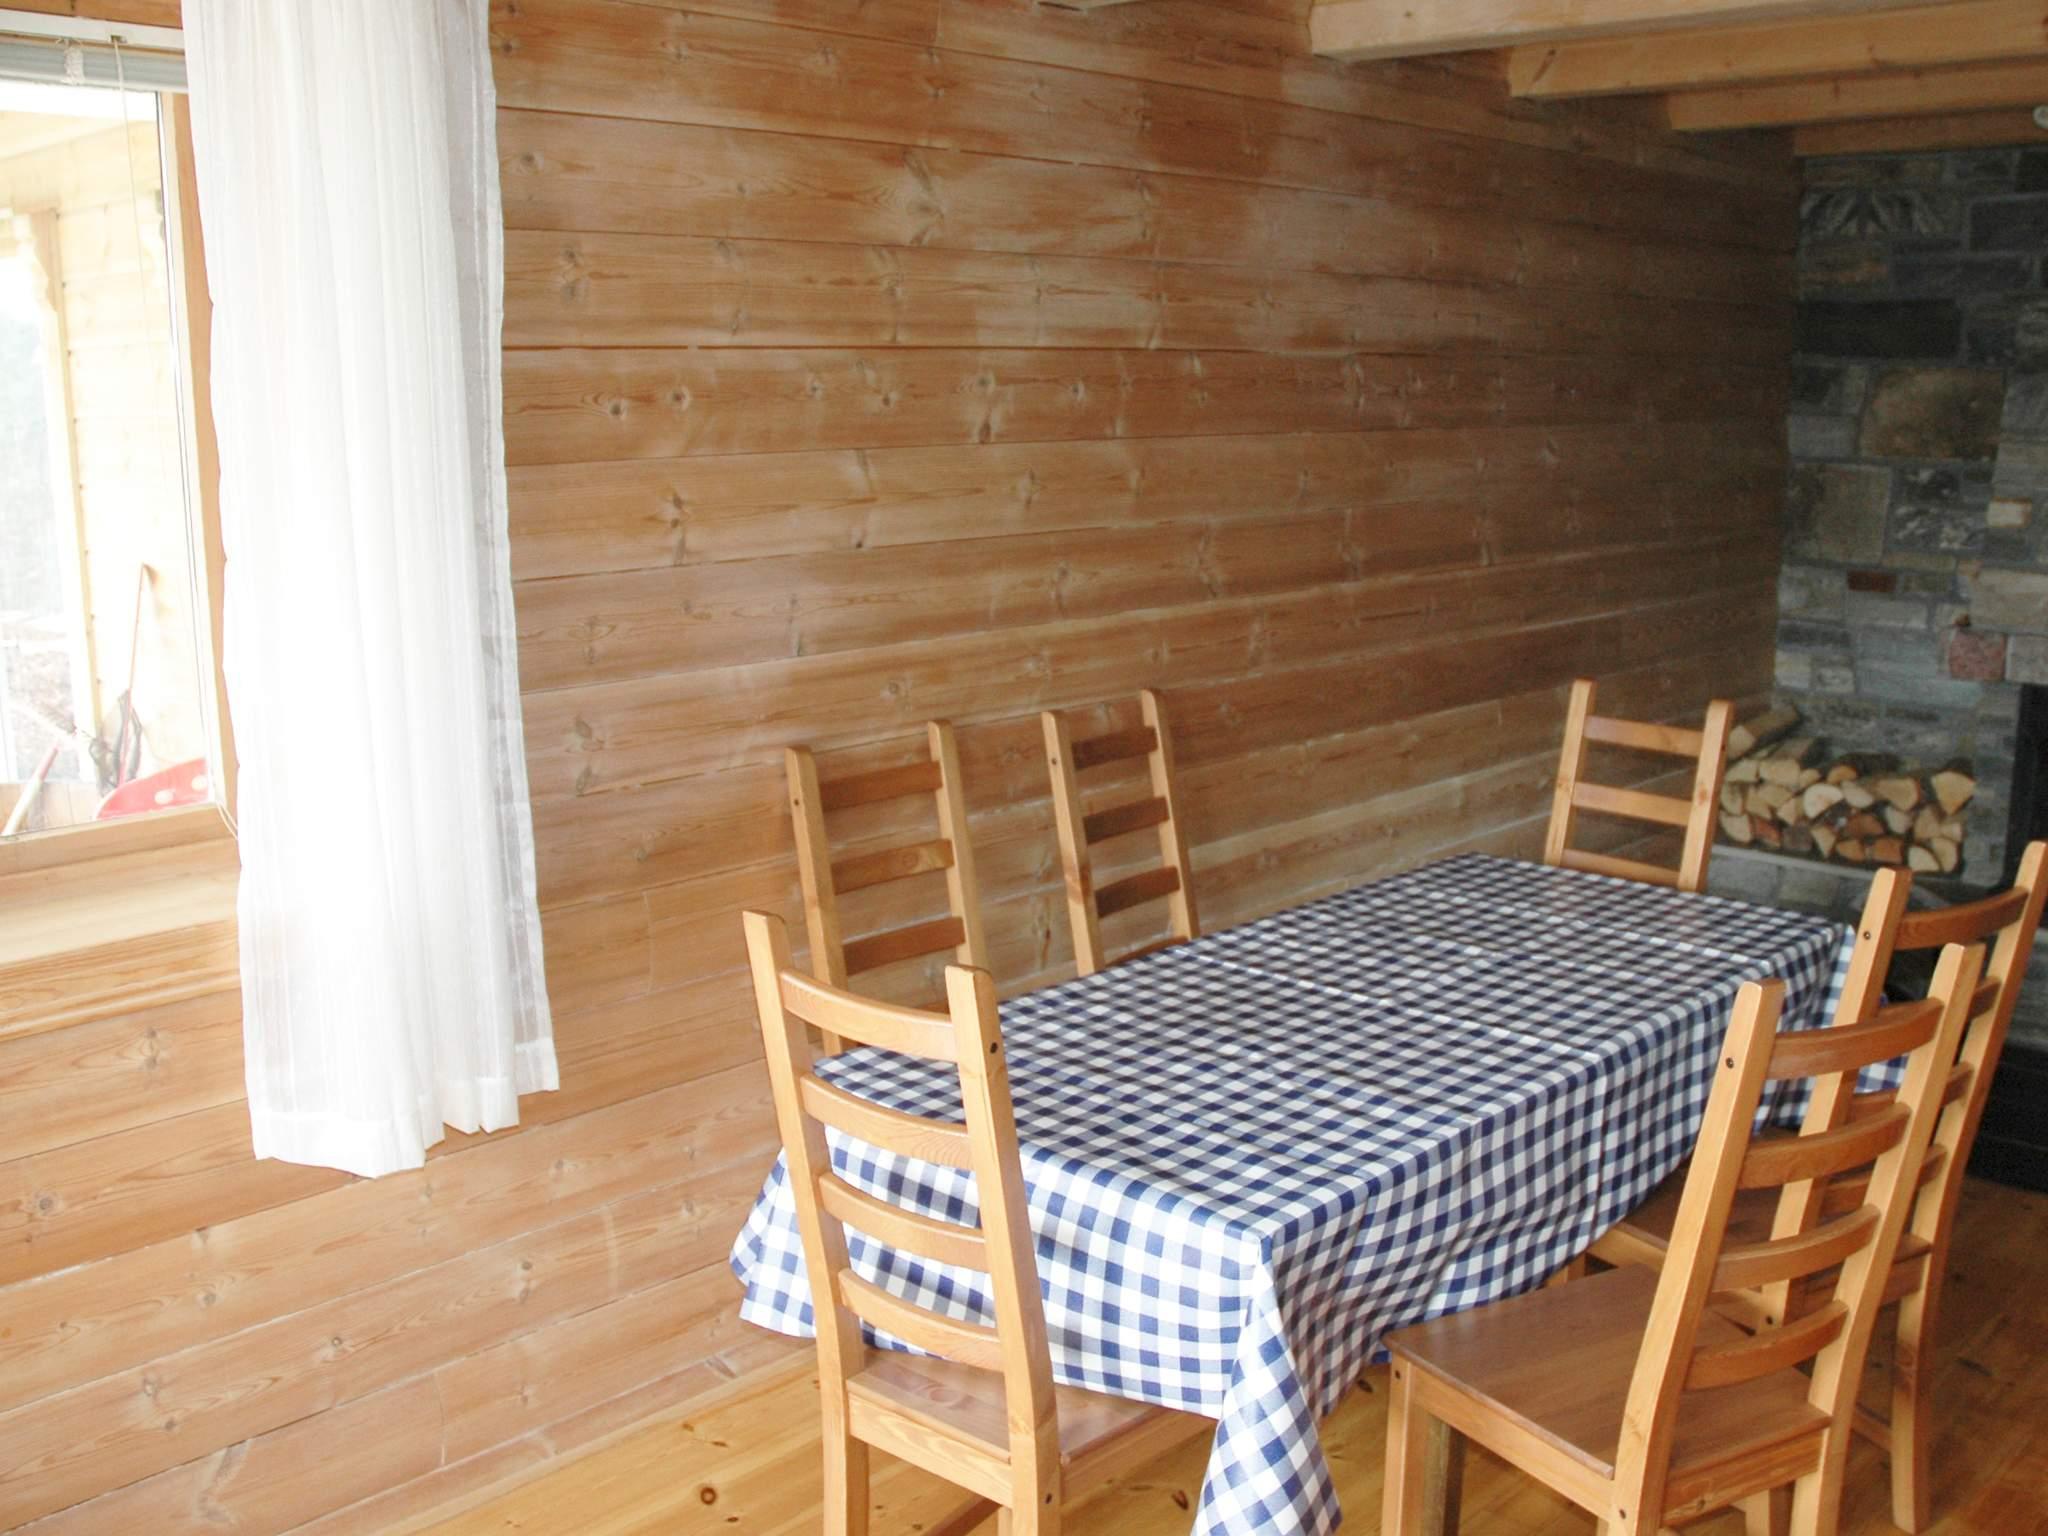 Ferienhaus Hindenes (297698), Ostereidet, Hordaland - Hardangerfjord, Westnorwegen, Norwegen, Bild 17